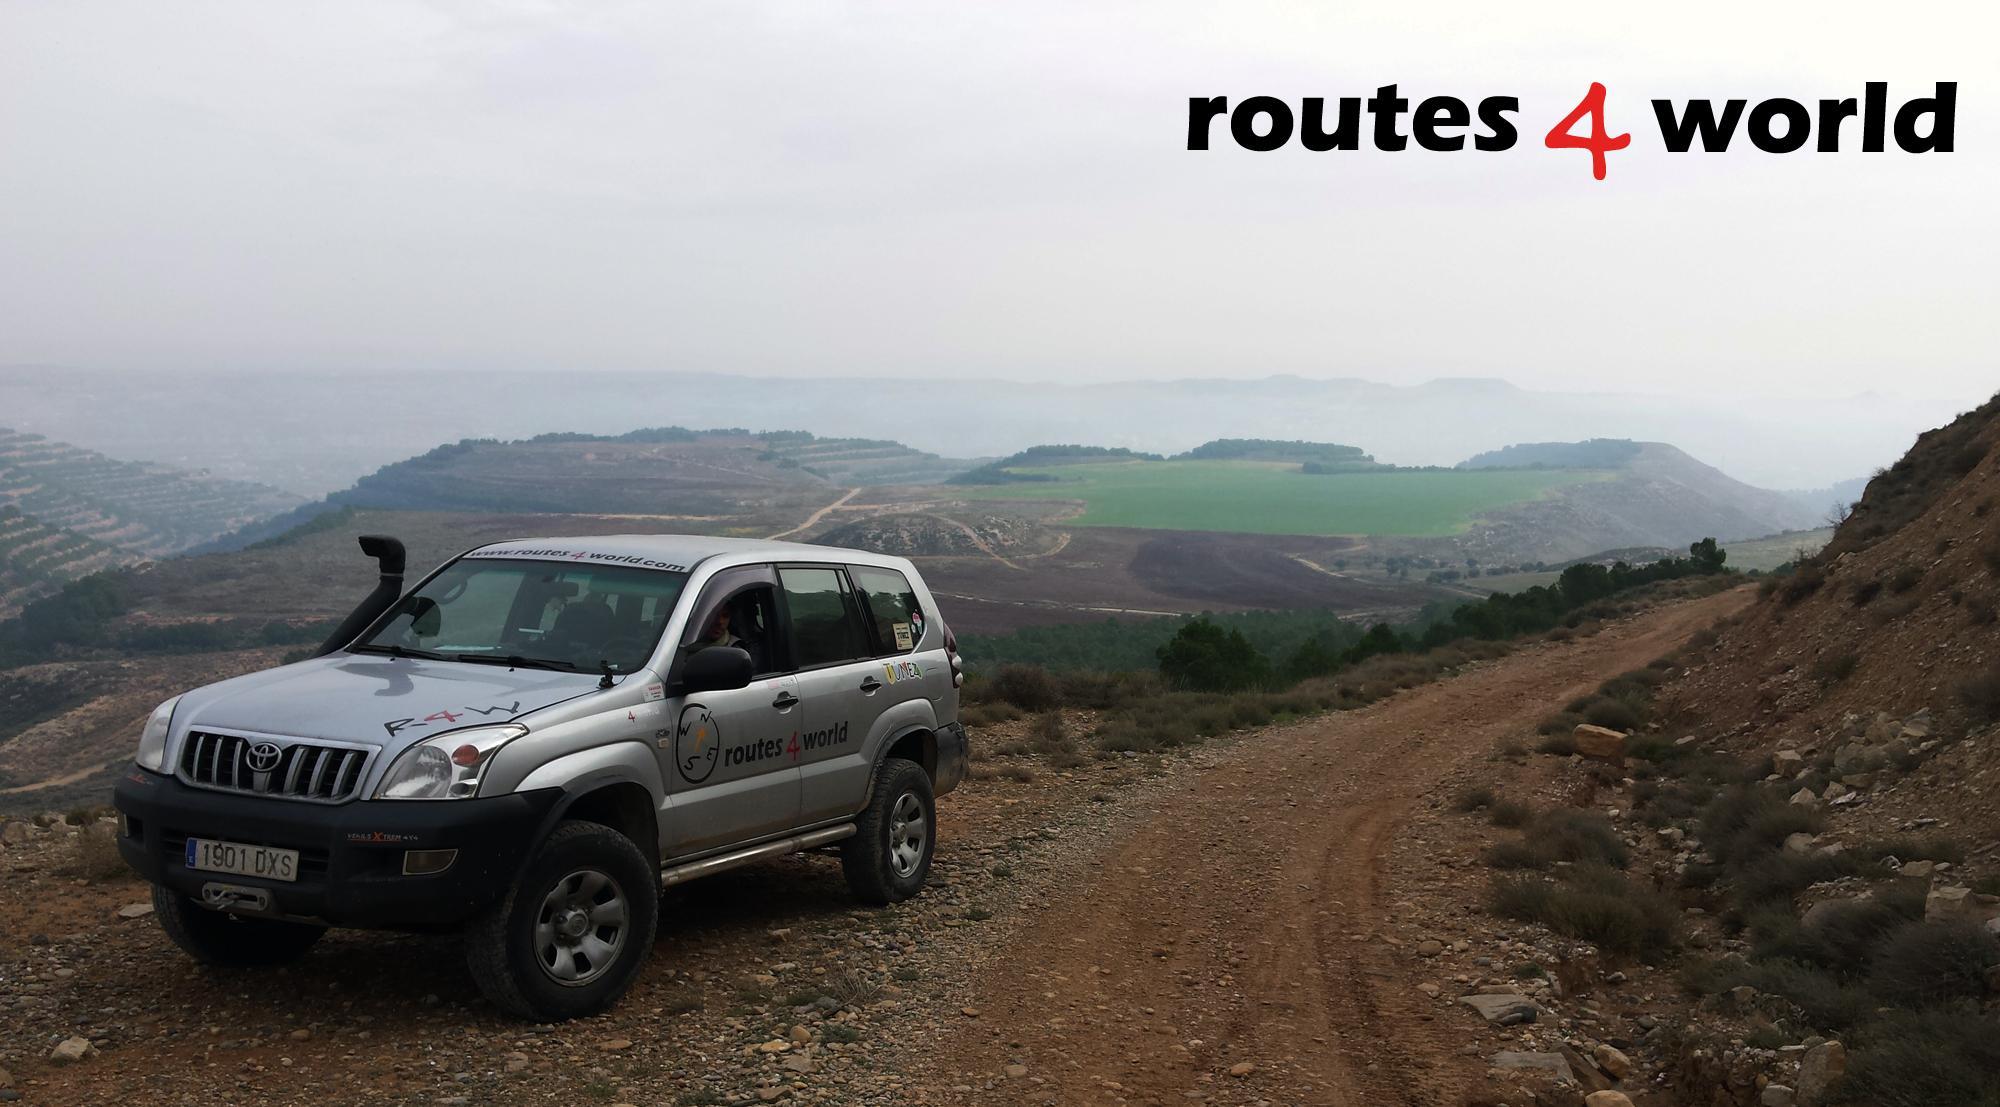 Monegros R4W - routes4world (43)